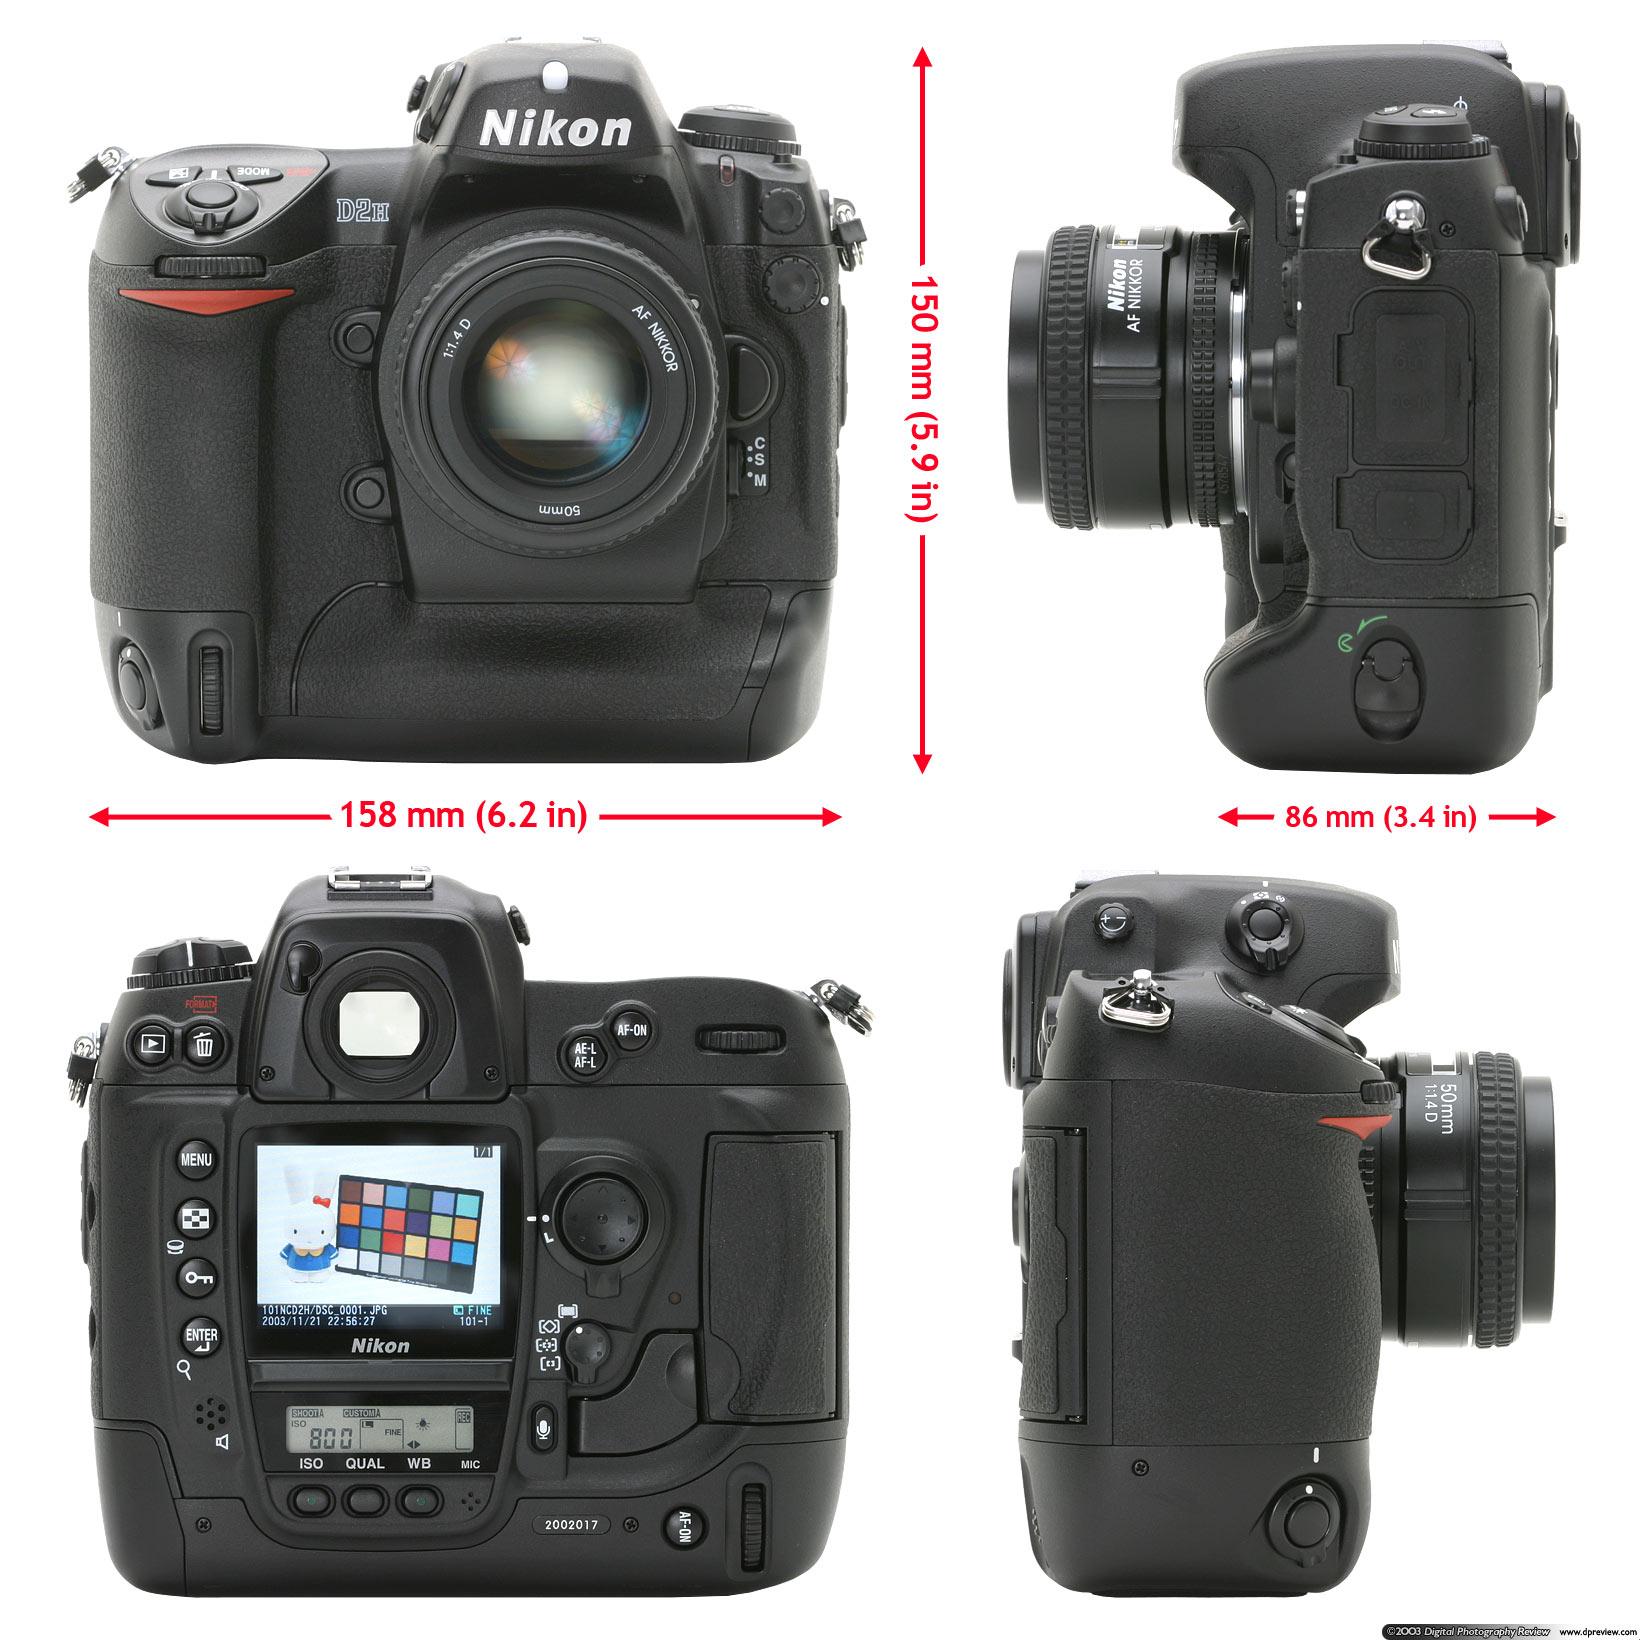 how to change image quality on nikon